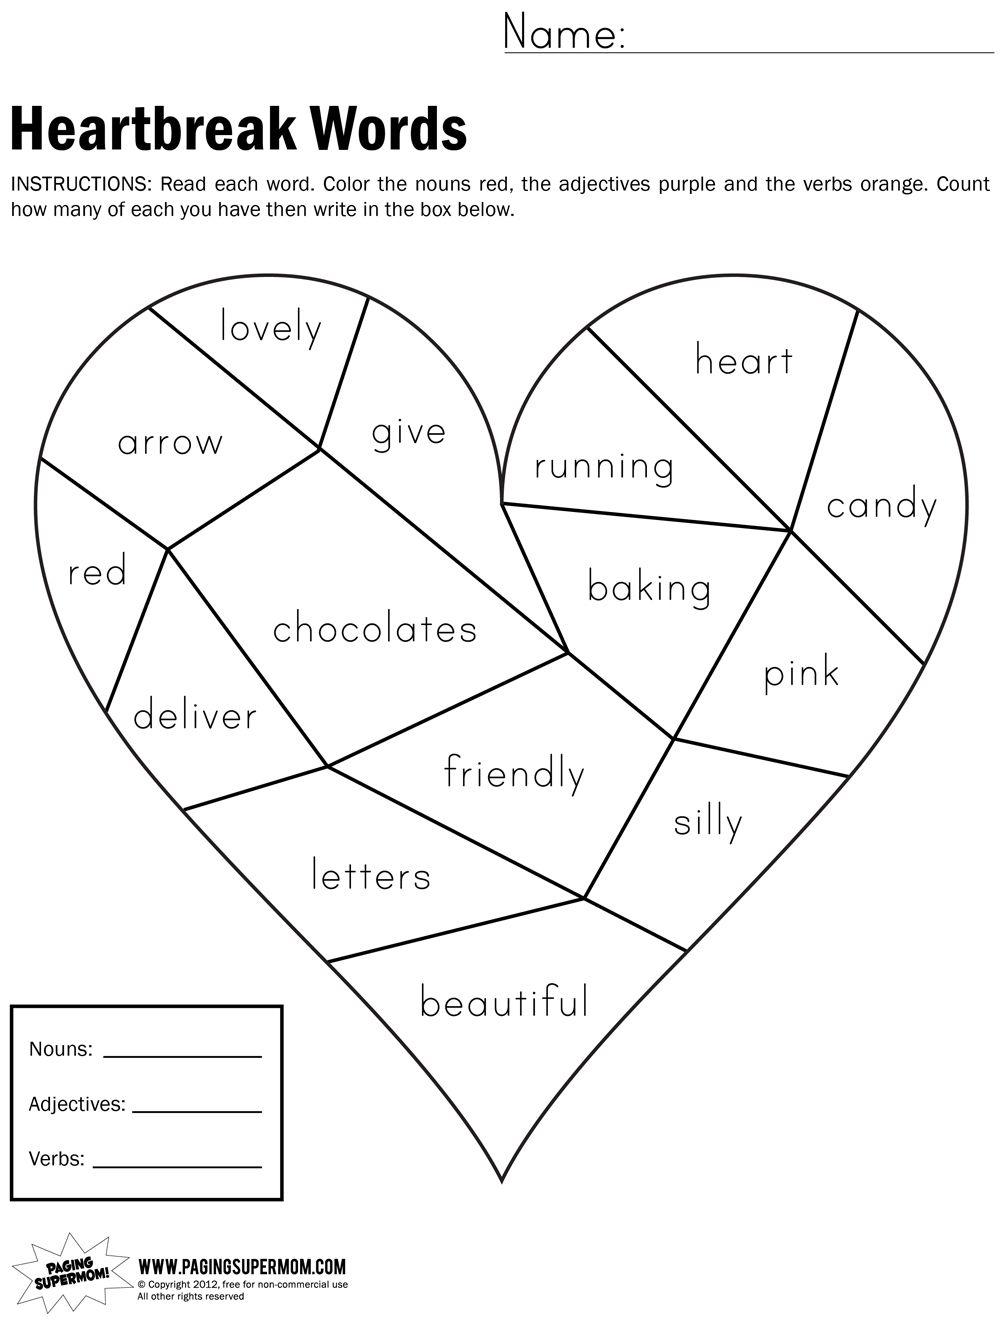 hight resolution of Heartbreak Words Free Printable Worksheet   Paging Supermom   Color  worksheets